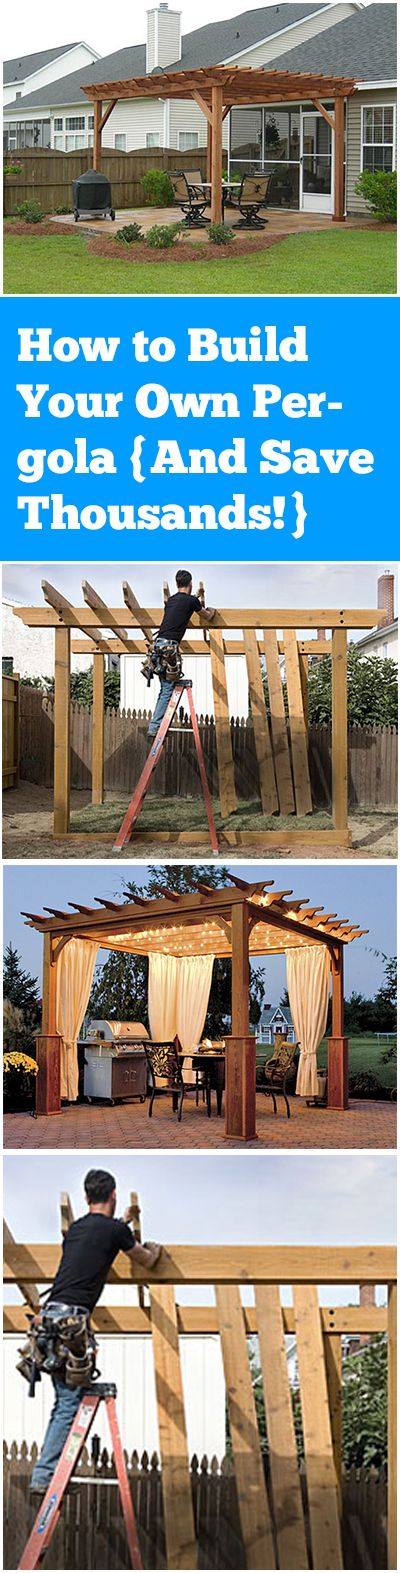 Porch Pergola Plans   Outdoor Plans And Projects | WoodArchivist.com |  Outdoor Plans | Pinterest | Pergola Plans, Pergolas And Porch